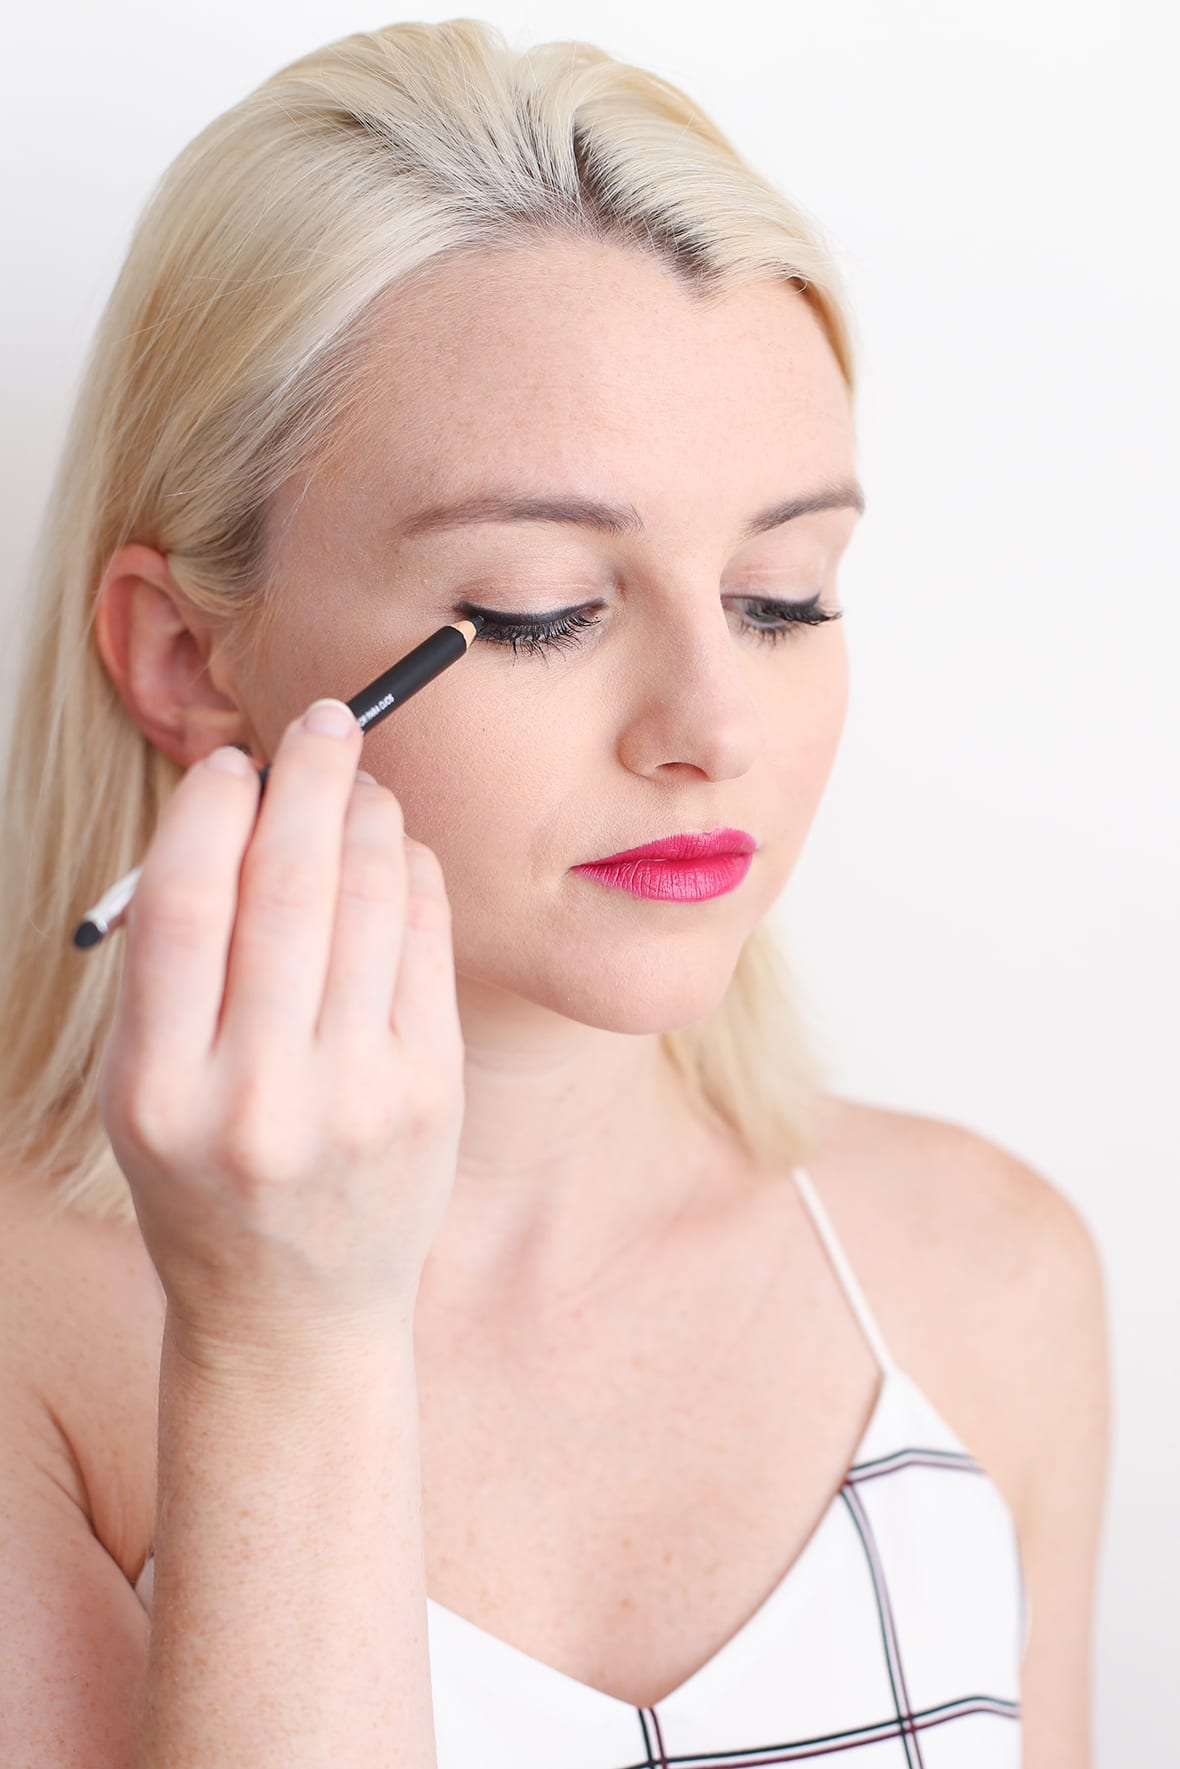 Poor Little It Girl - Drugstore Makeup Roundup with Revlon - @poolilitgirl